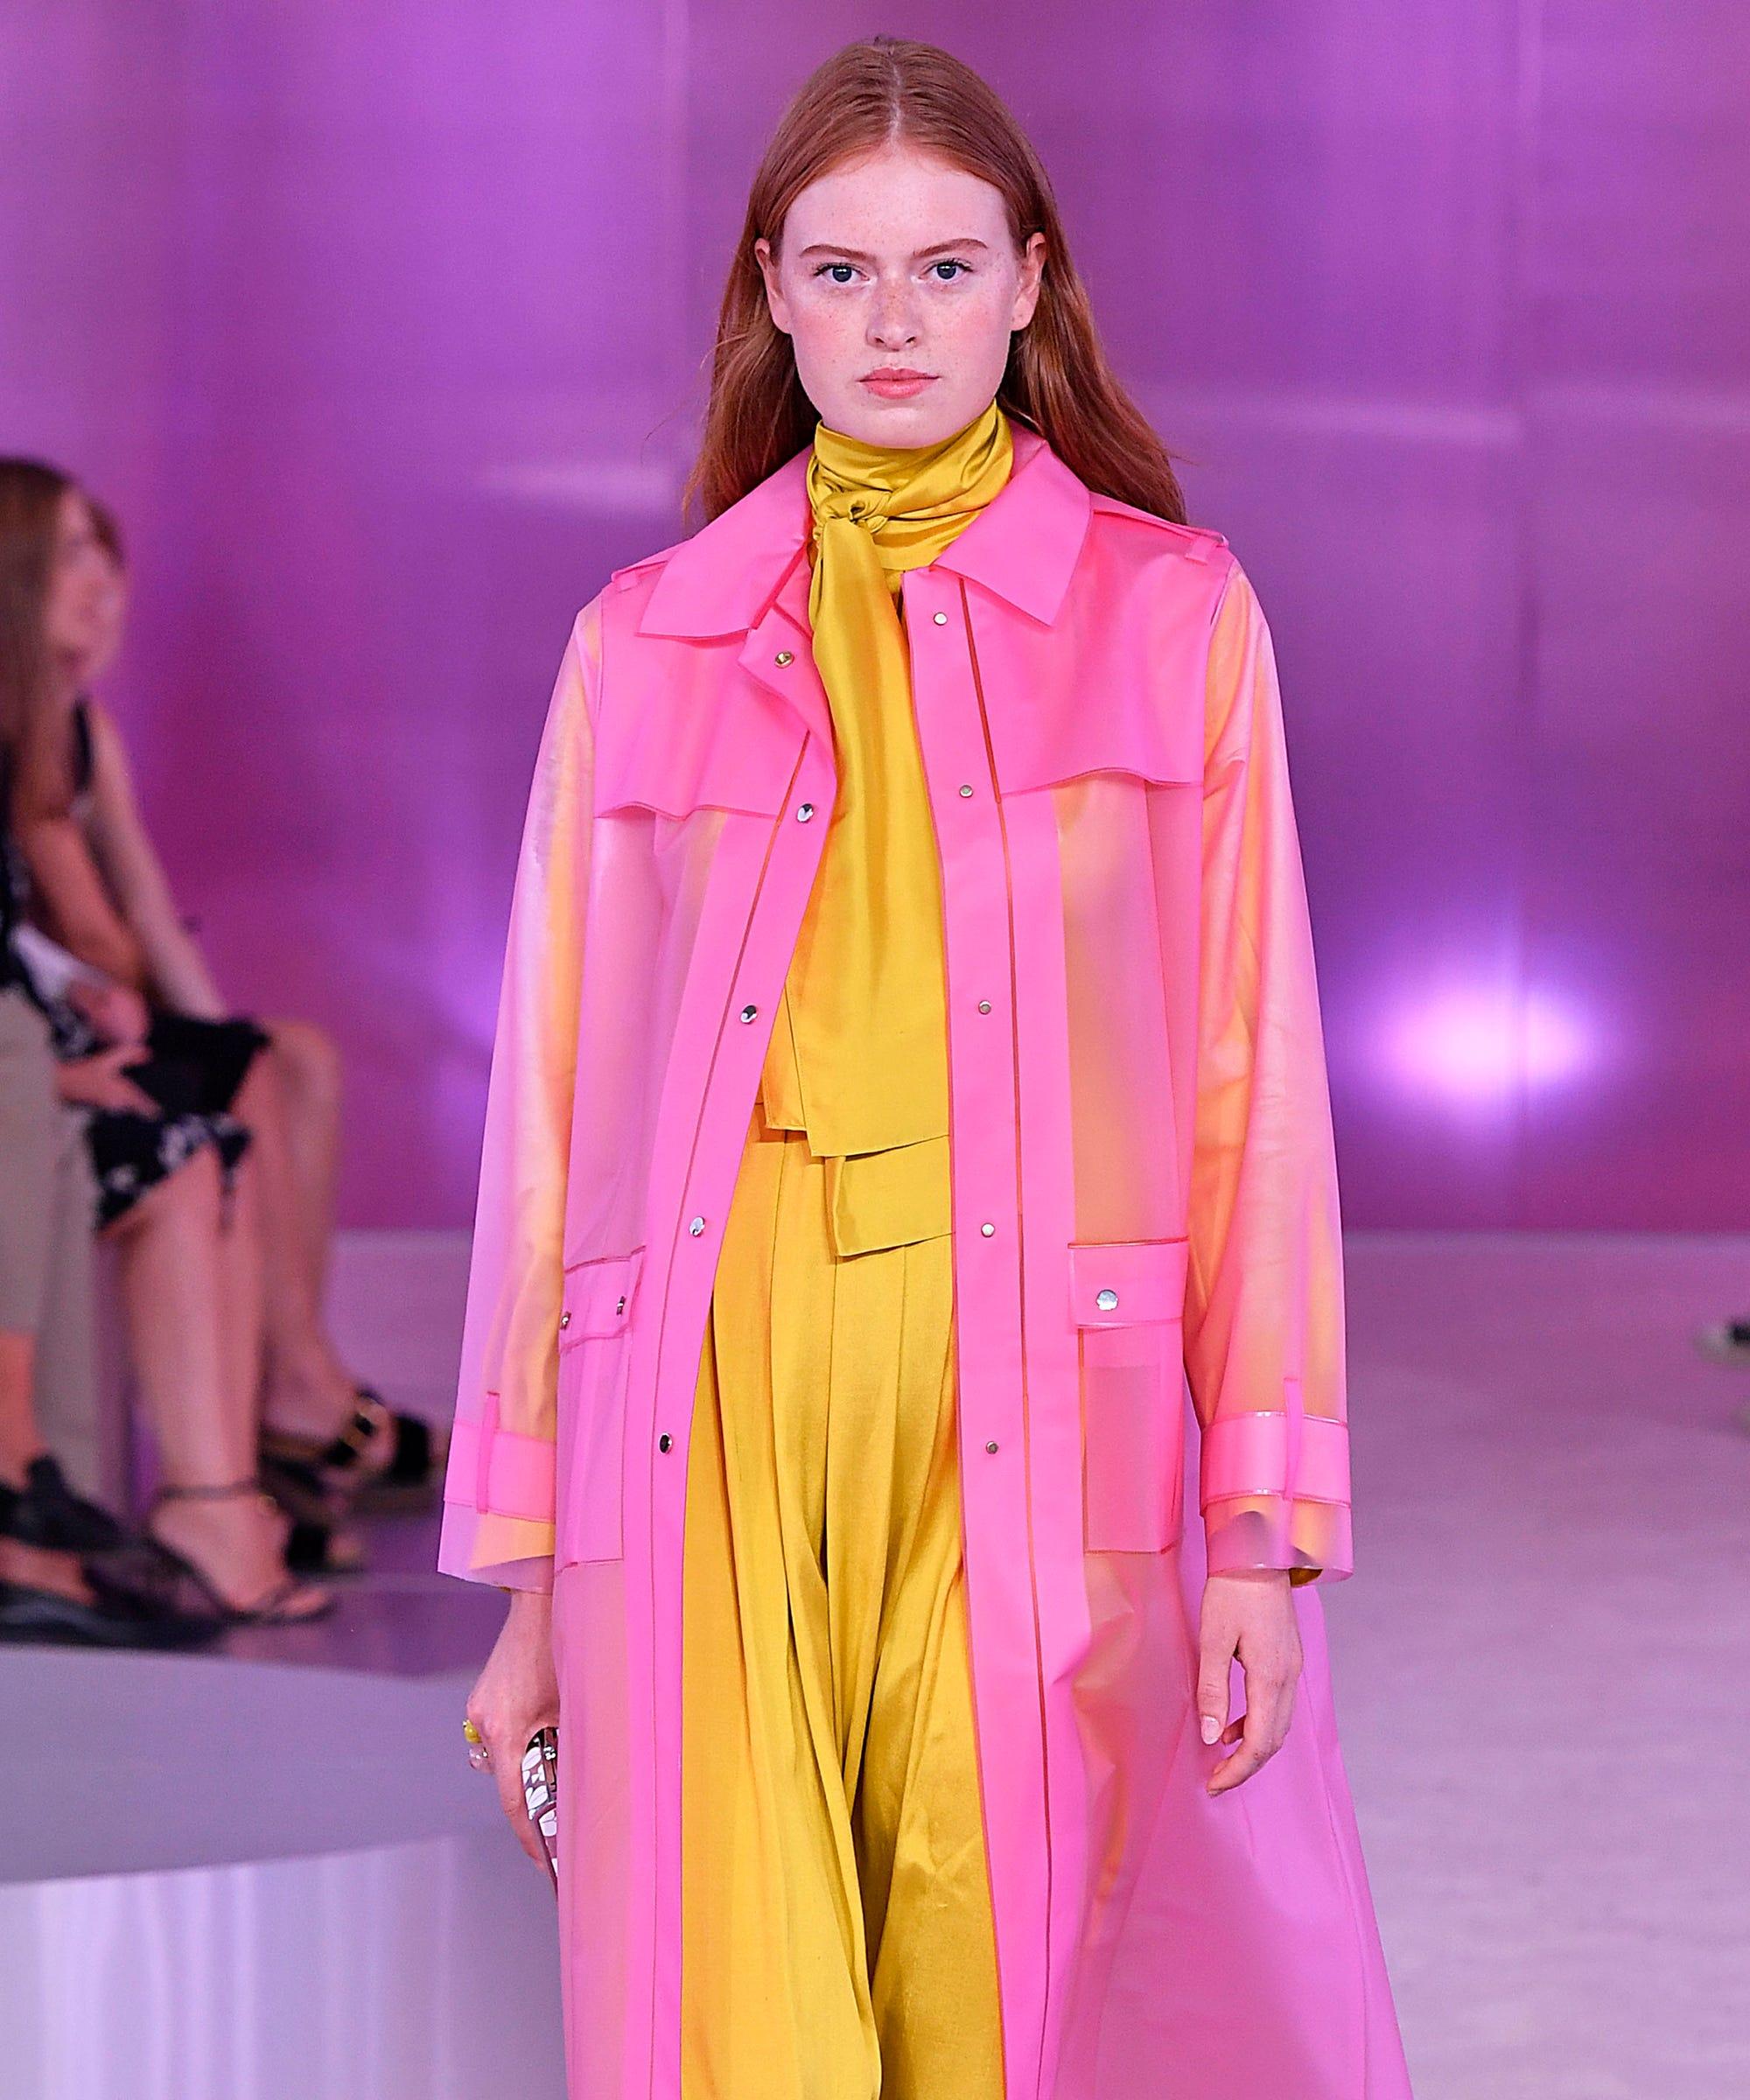 Fast Fashion Brand Alternatives - Ethical Sustainable